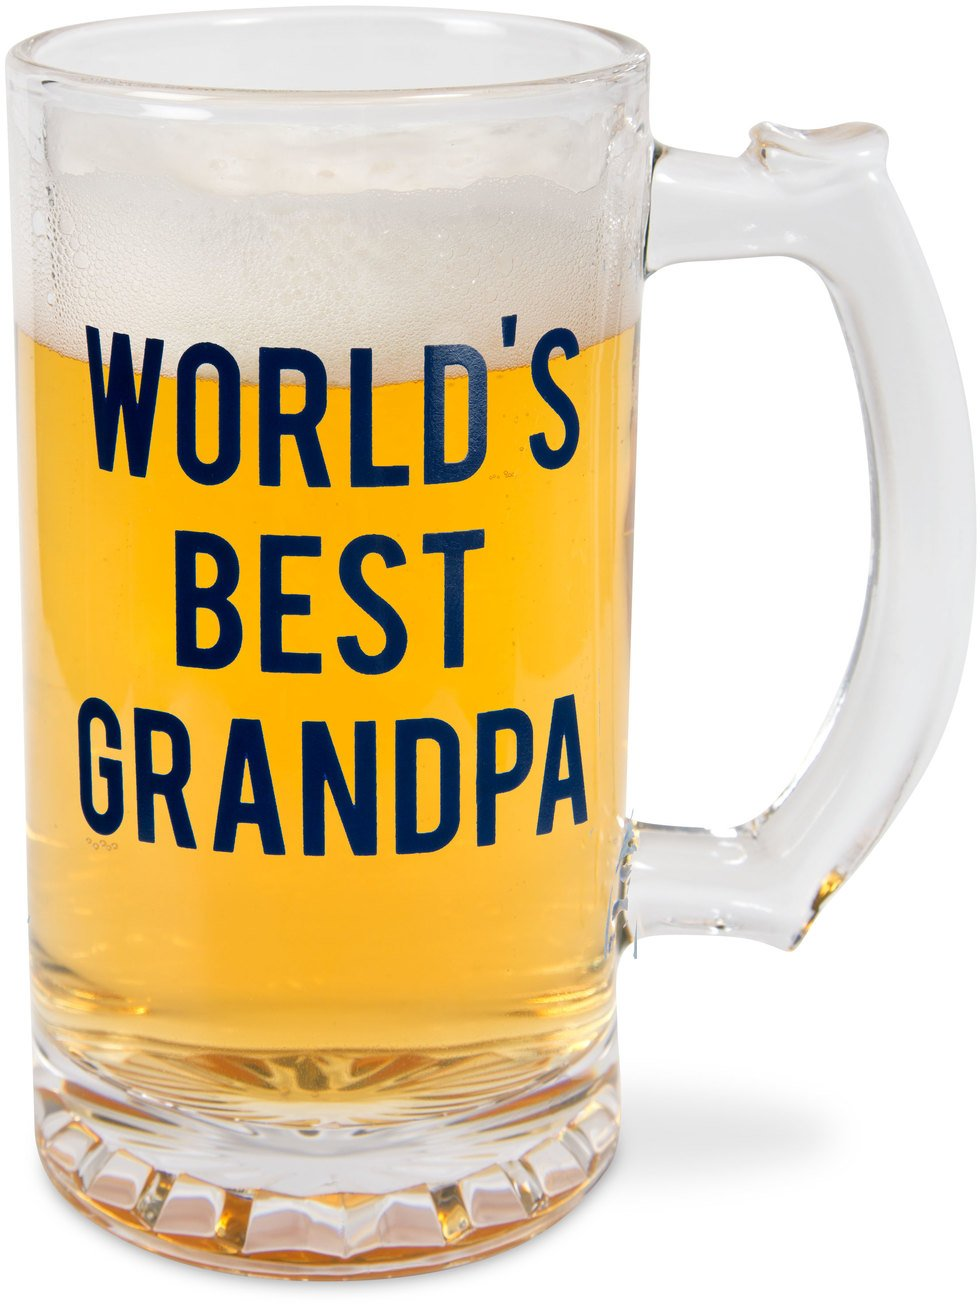 Pavilion World's Best Grandpa 16 oz Glass Beer Stein Pavilion Gift Company 14277